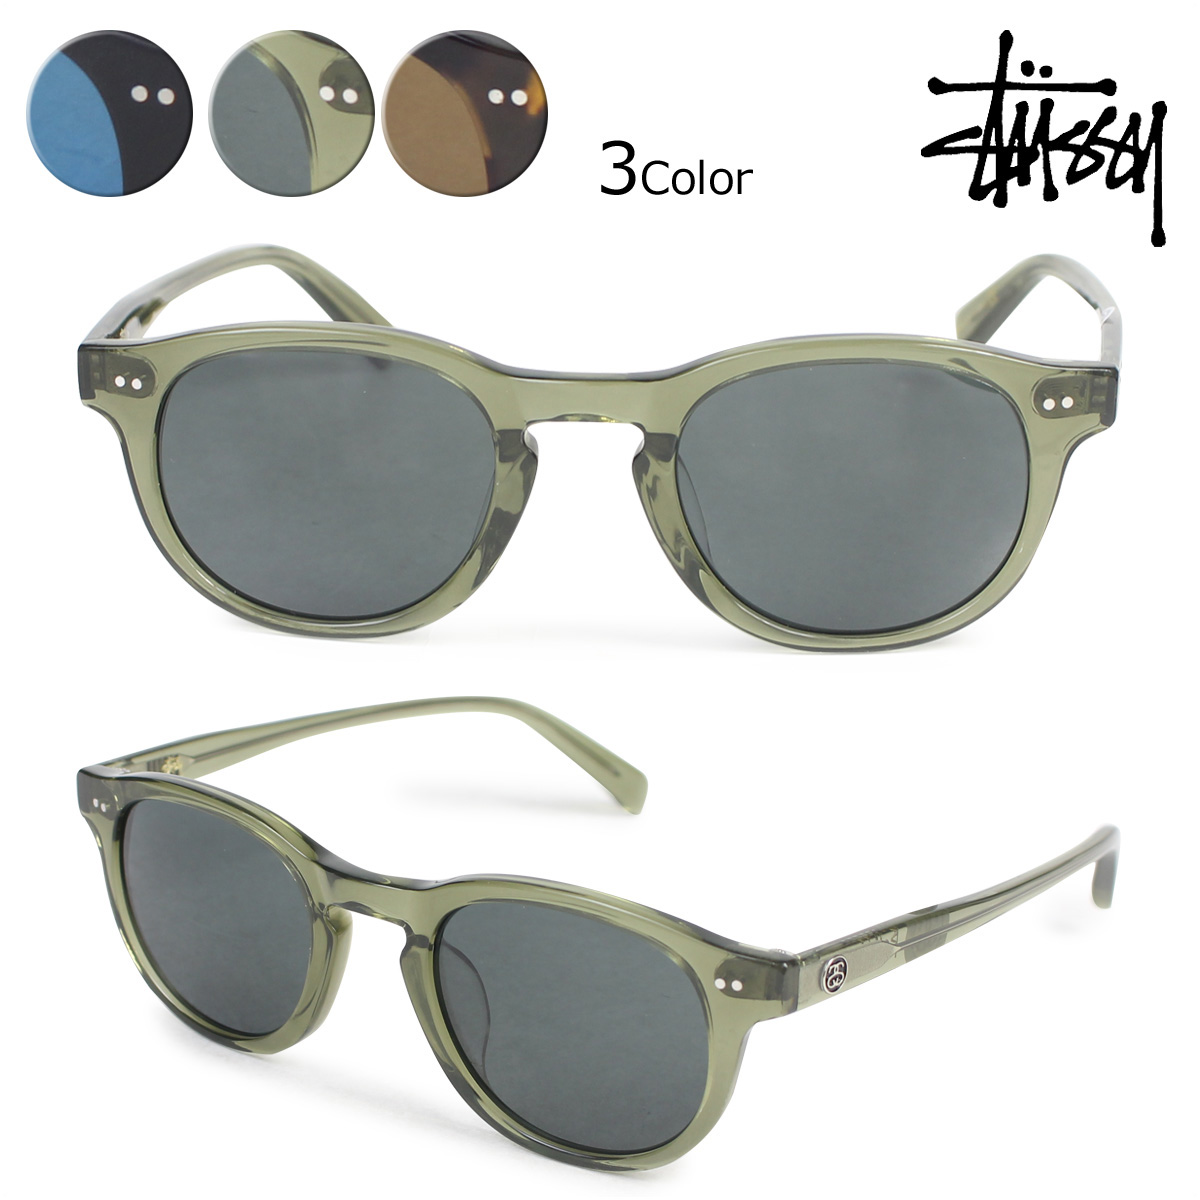 7d24ad5b2b Sugar Online Shop  ステューシー STUSSY sunglasses men gap Dis UV cut Romeo ROMEO  EYEGEAR 140015 3 color  6 16 Shinnyu load